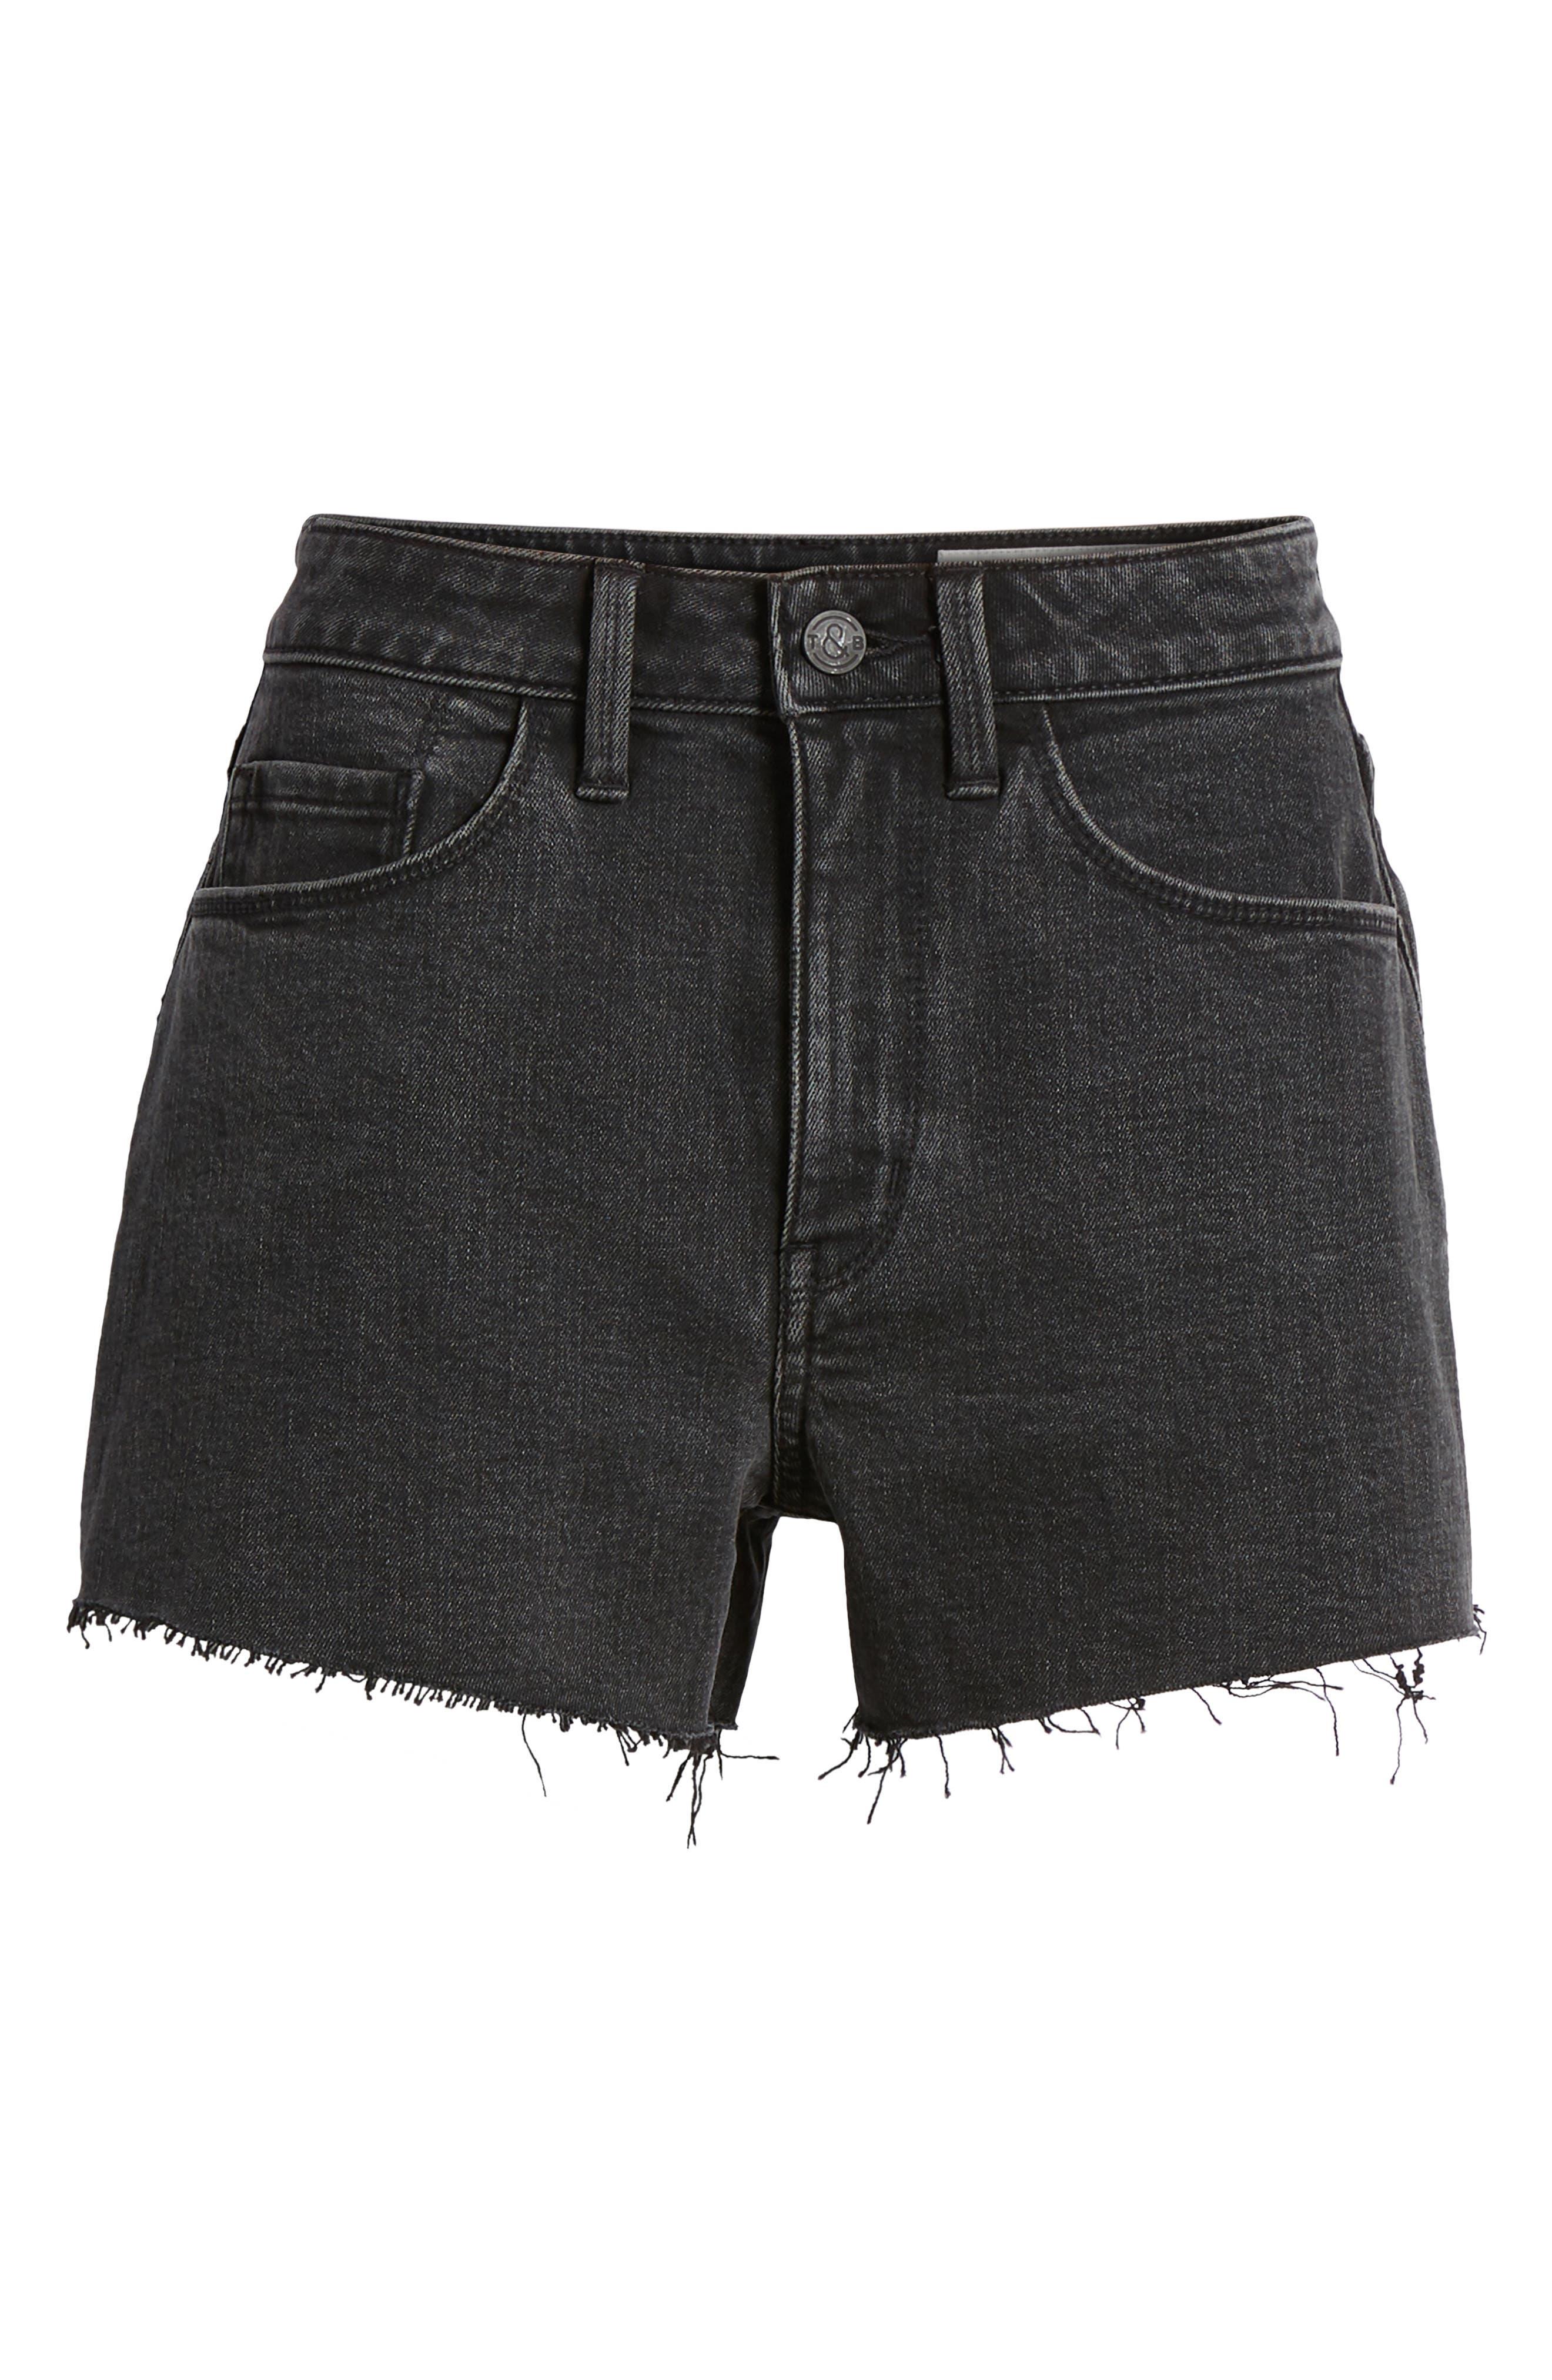 Foster High Waist Cutoff Boyfriend Denim Shorts,                             Alternate thumbnail 6, color,                             Blacktop Dark